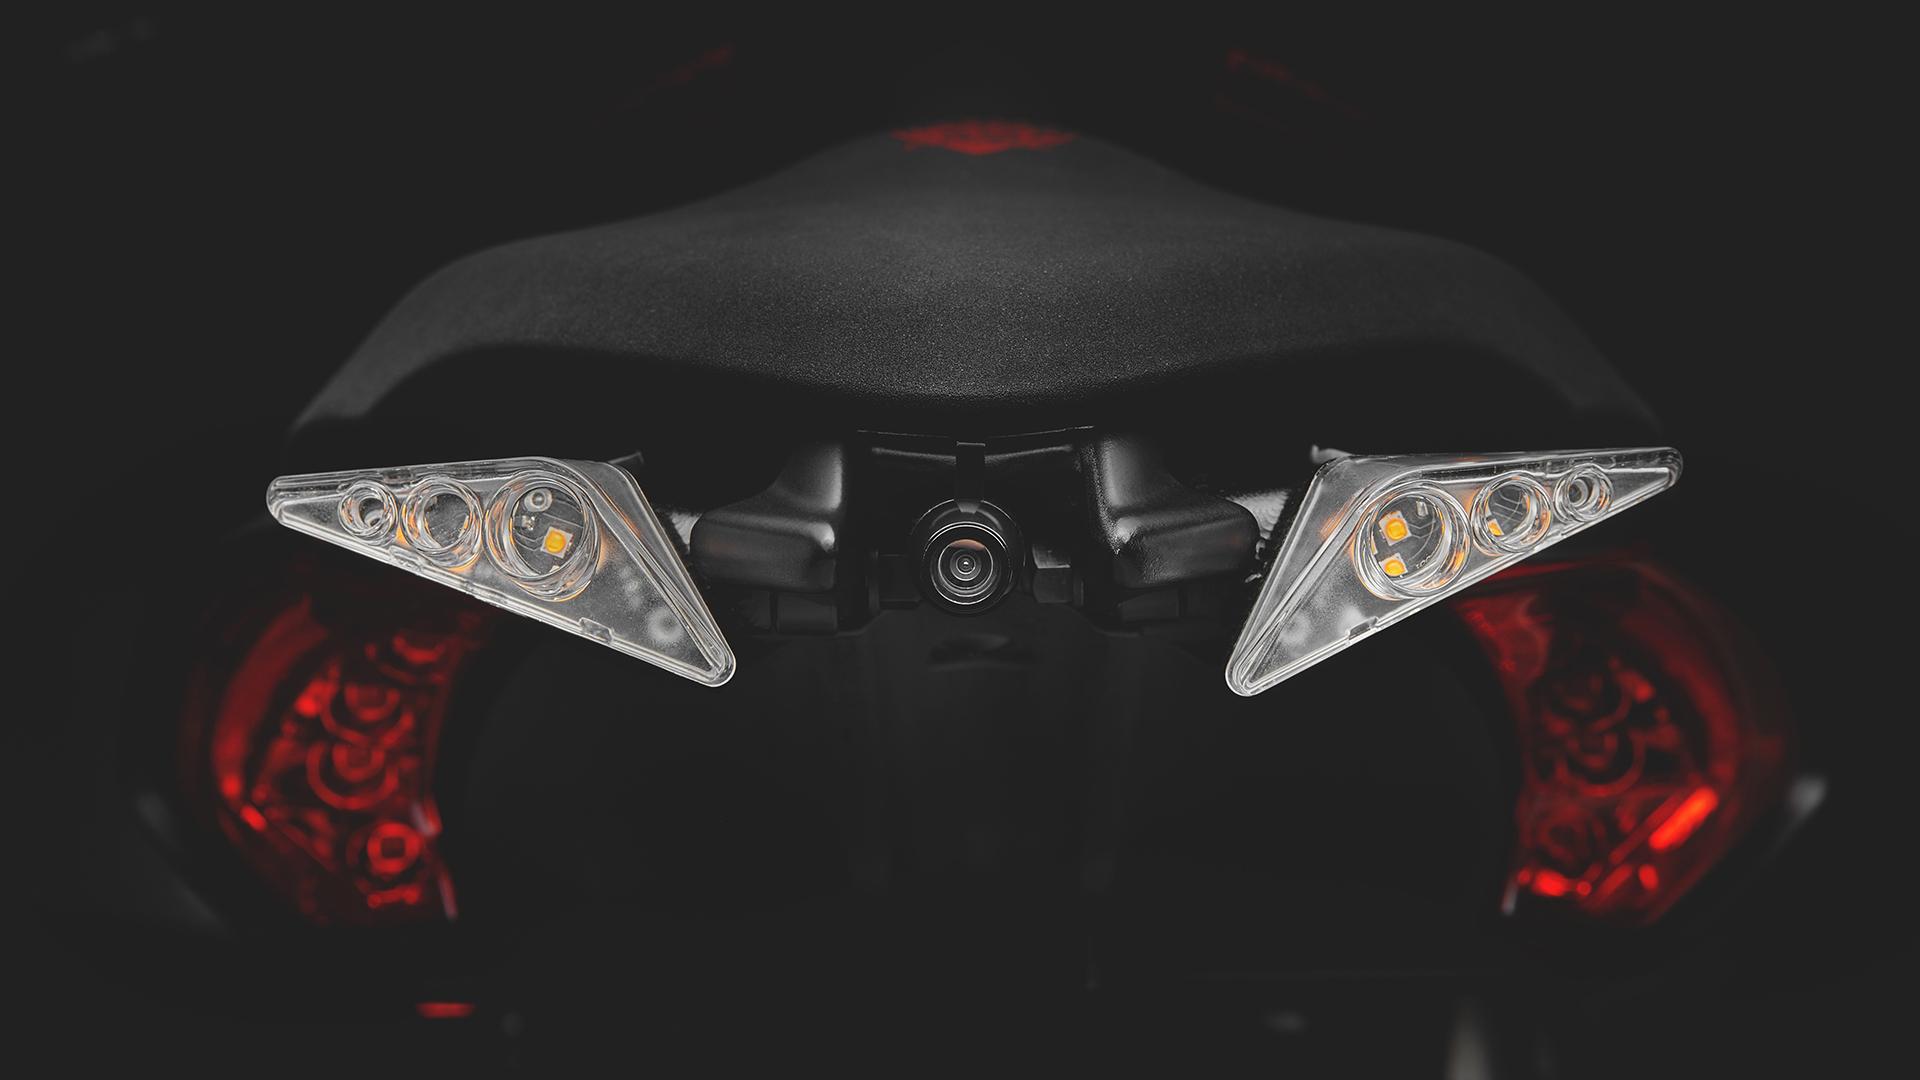 mv-agusta-dragster-blackout